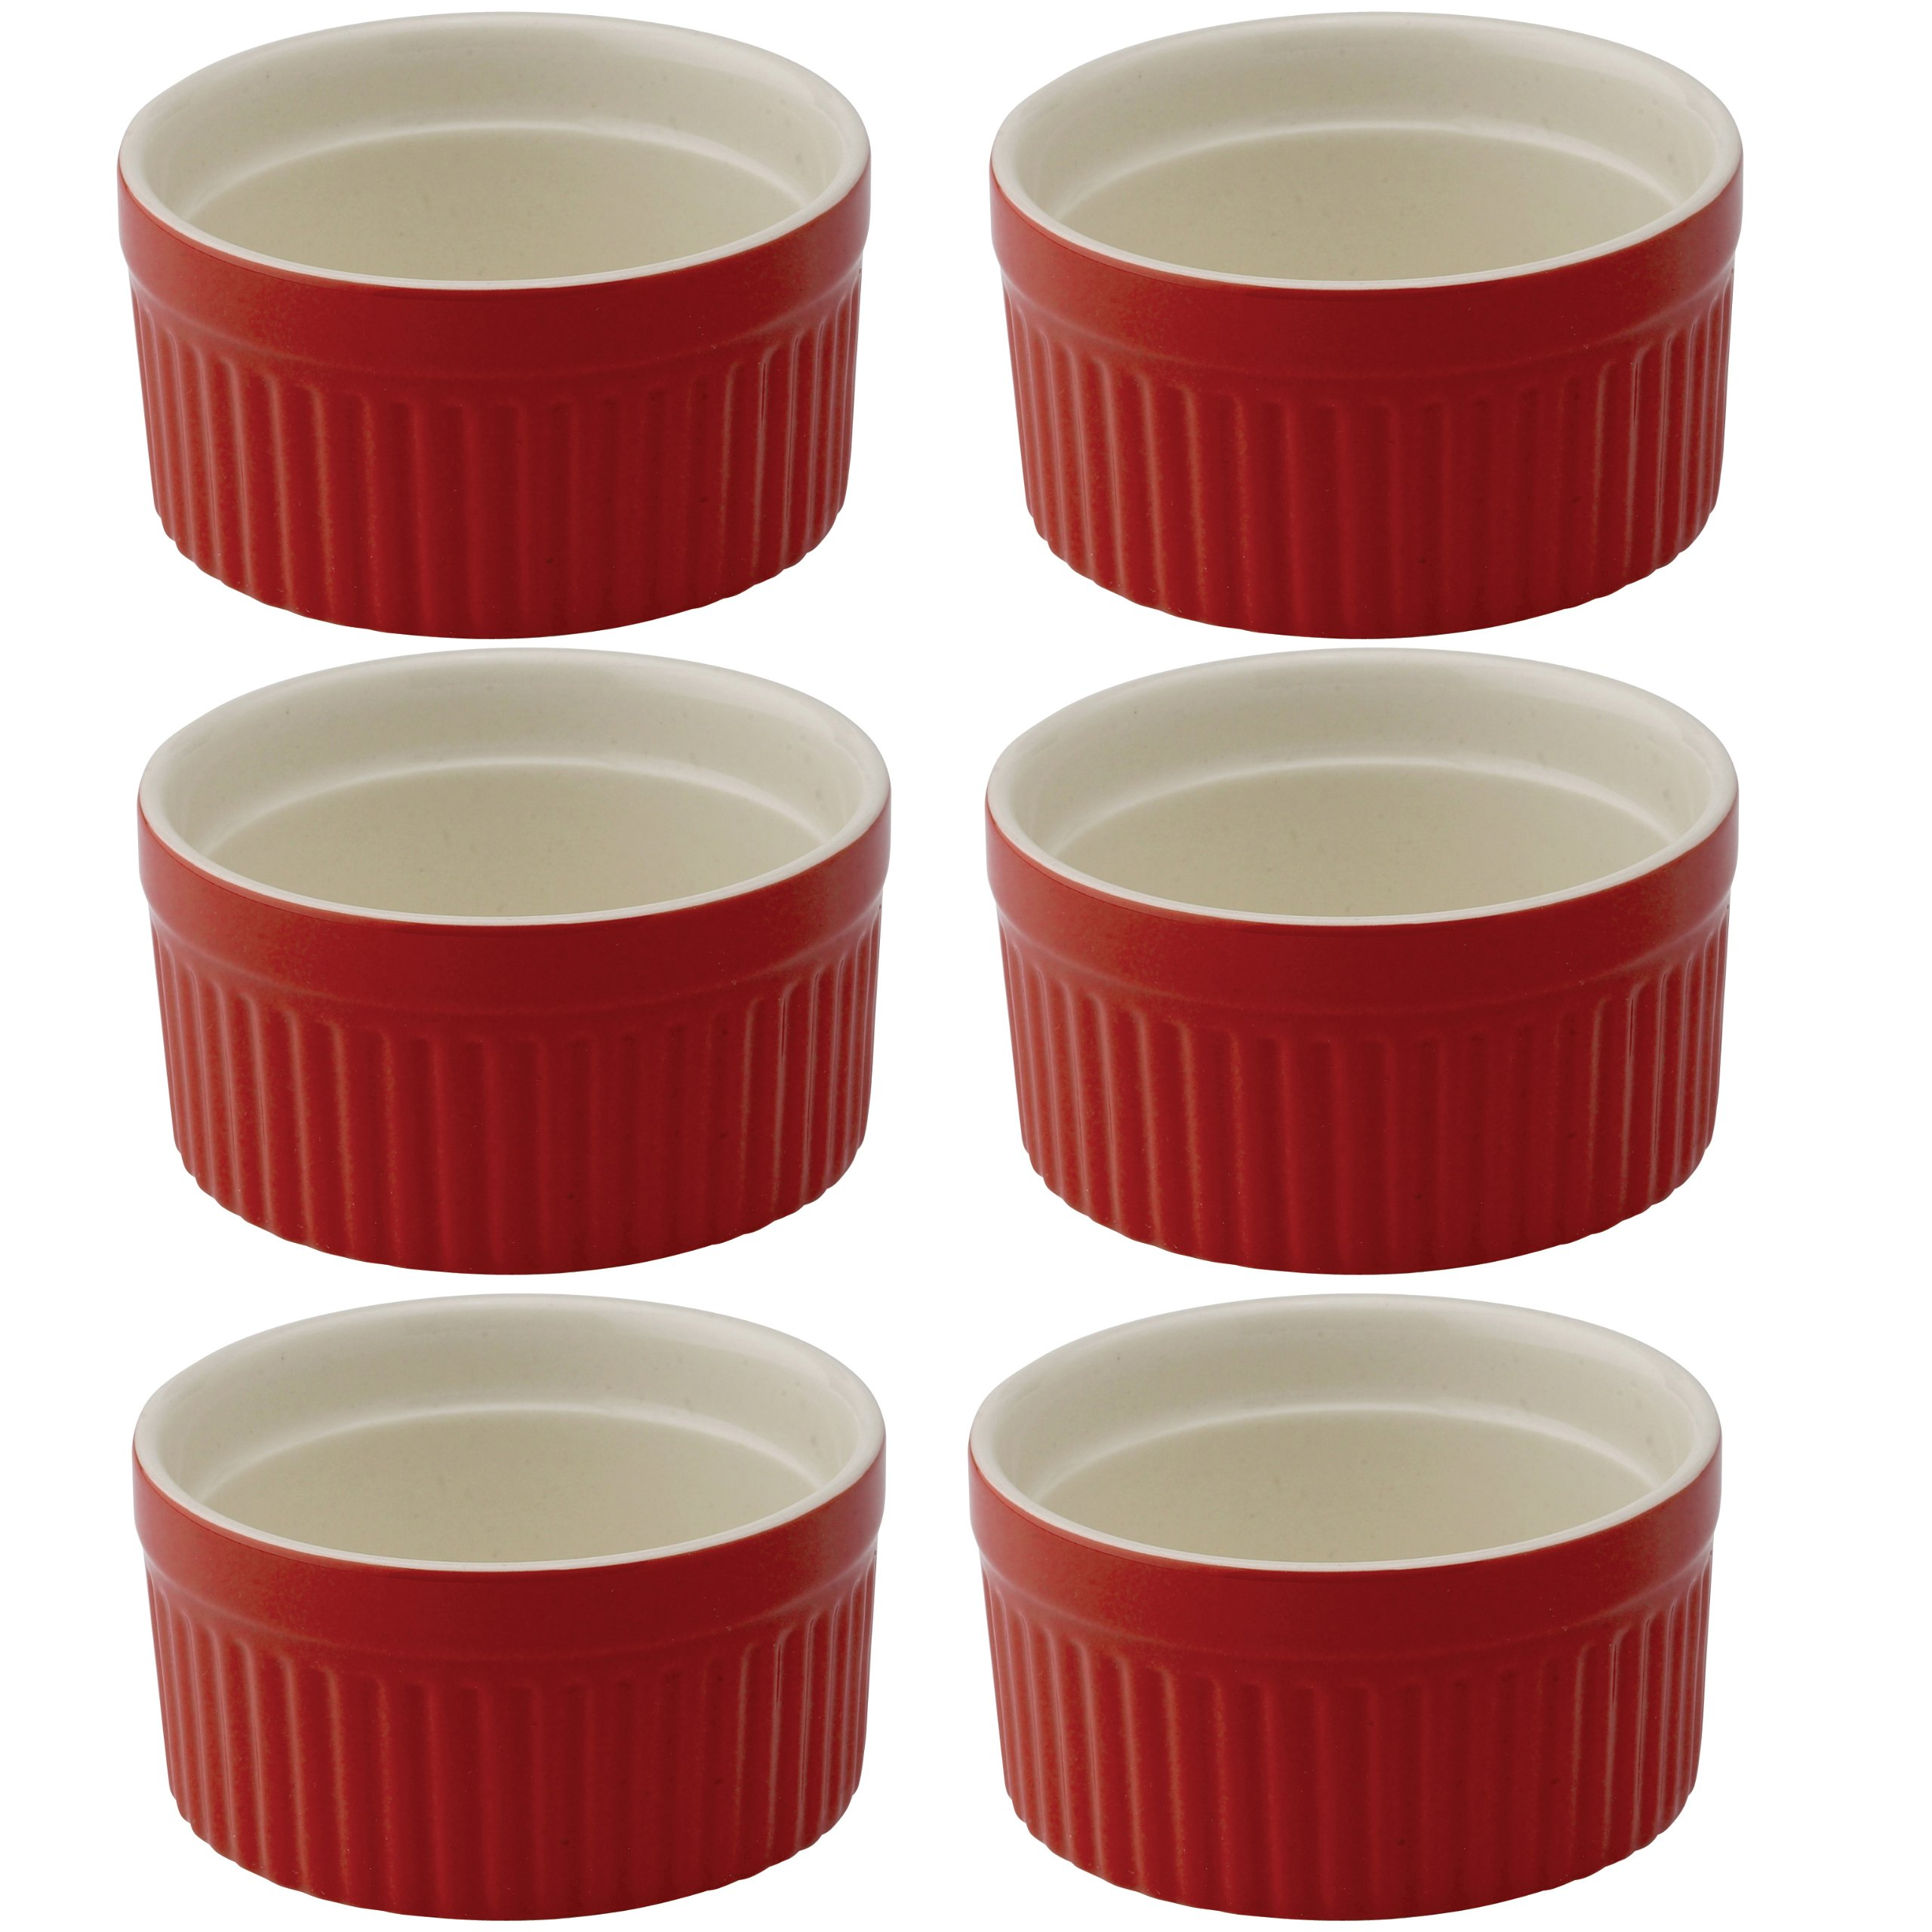 Mrs. Anderson's Baking Ramekin, Ceramic Earthenware, Rose, Set of 6, 2.5-Inch, 2-Ounce Capacity